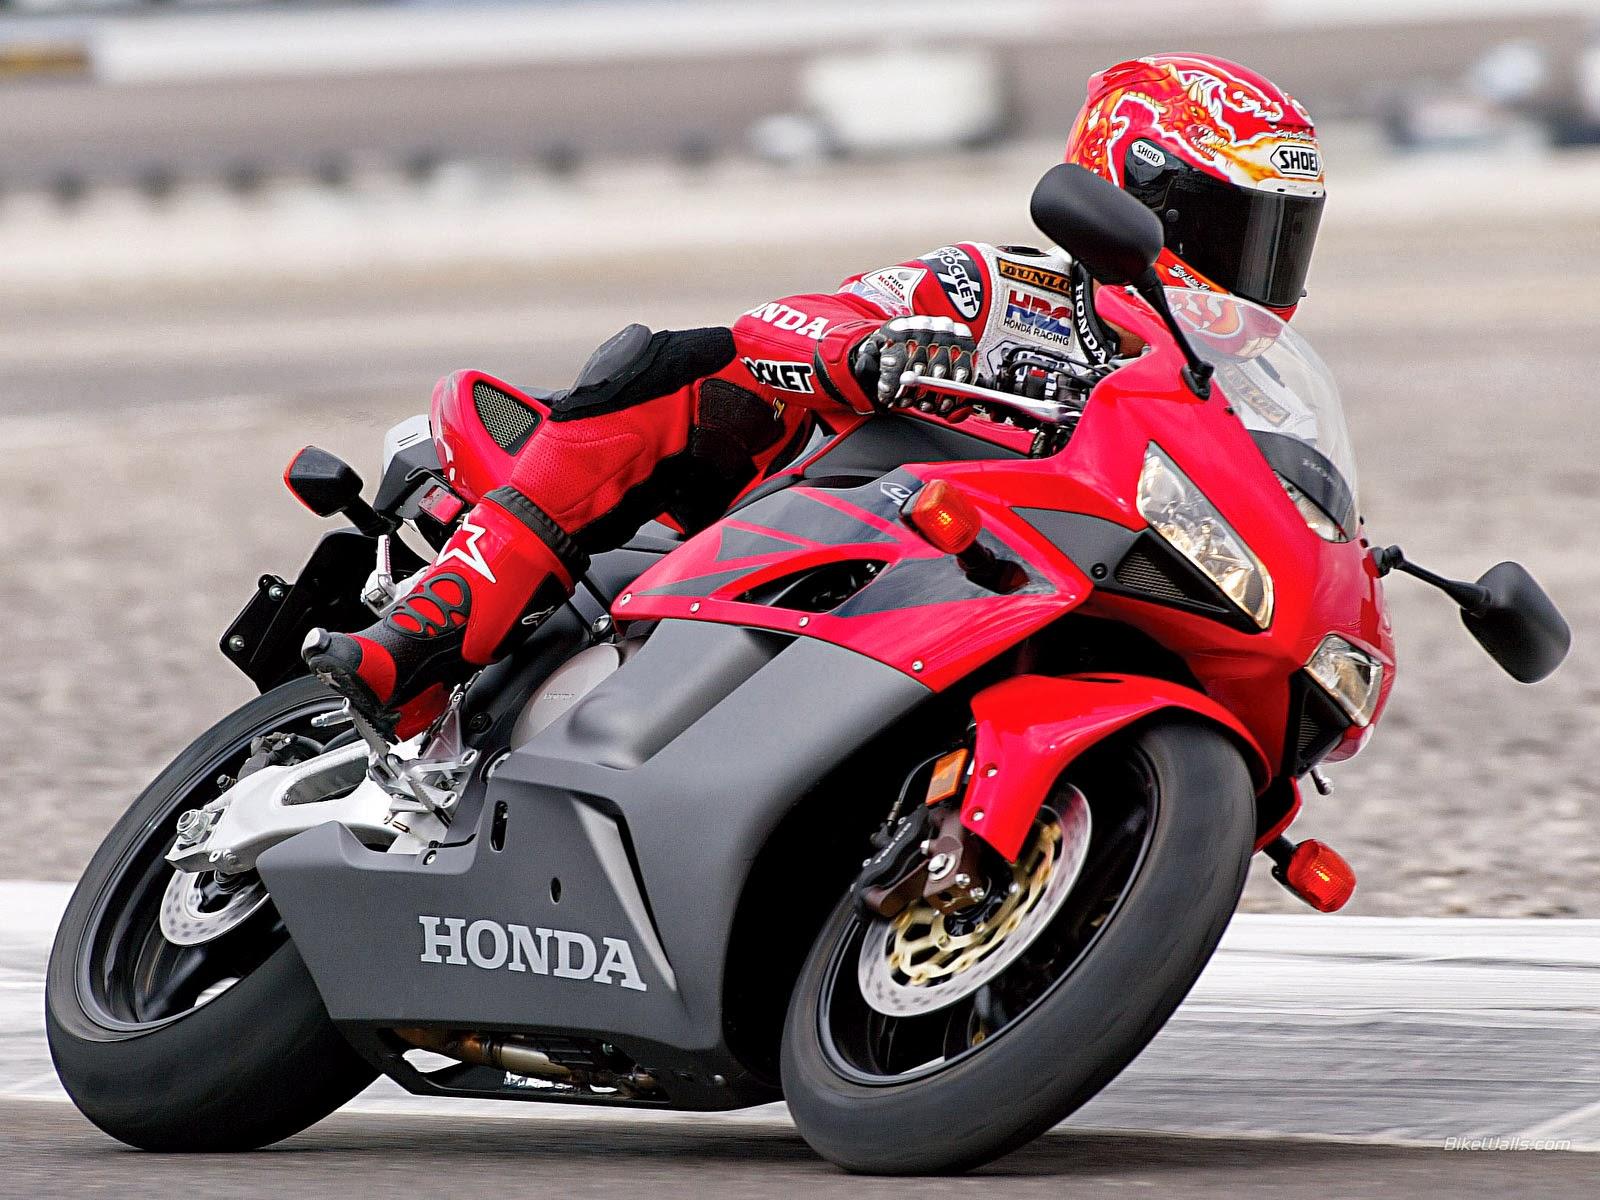 Honda motor honda cbr 100 rr motorlar for South motors honda us1